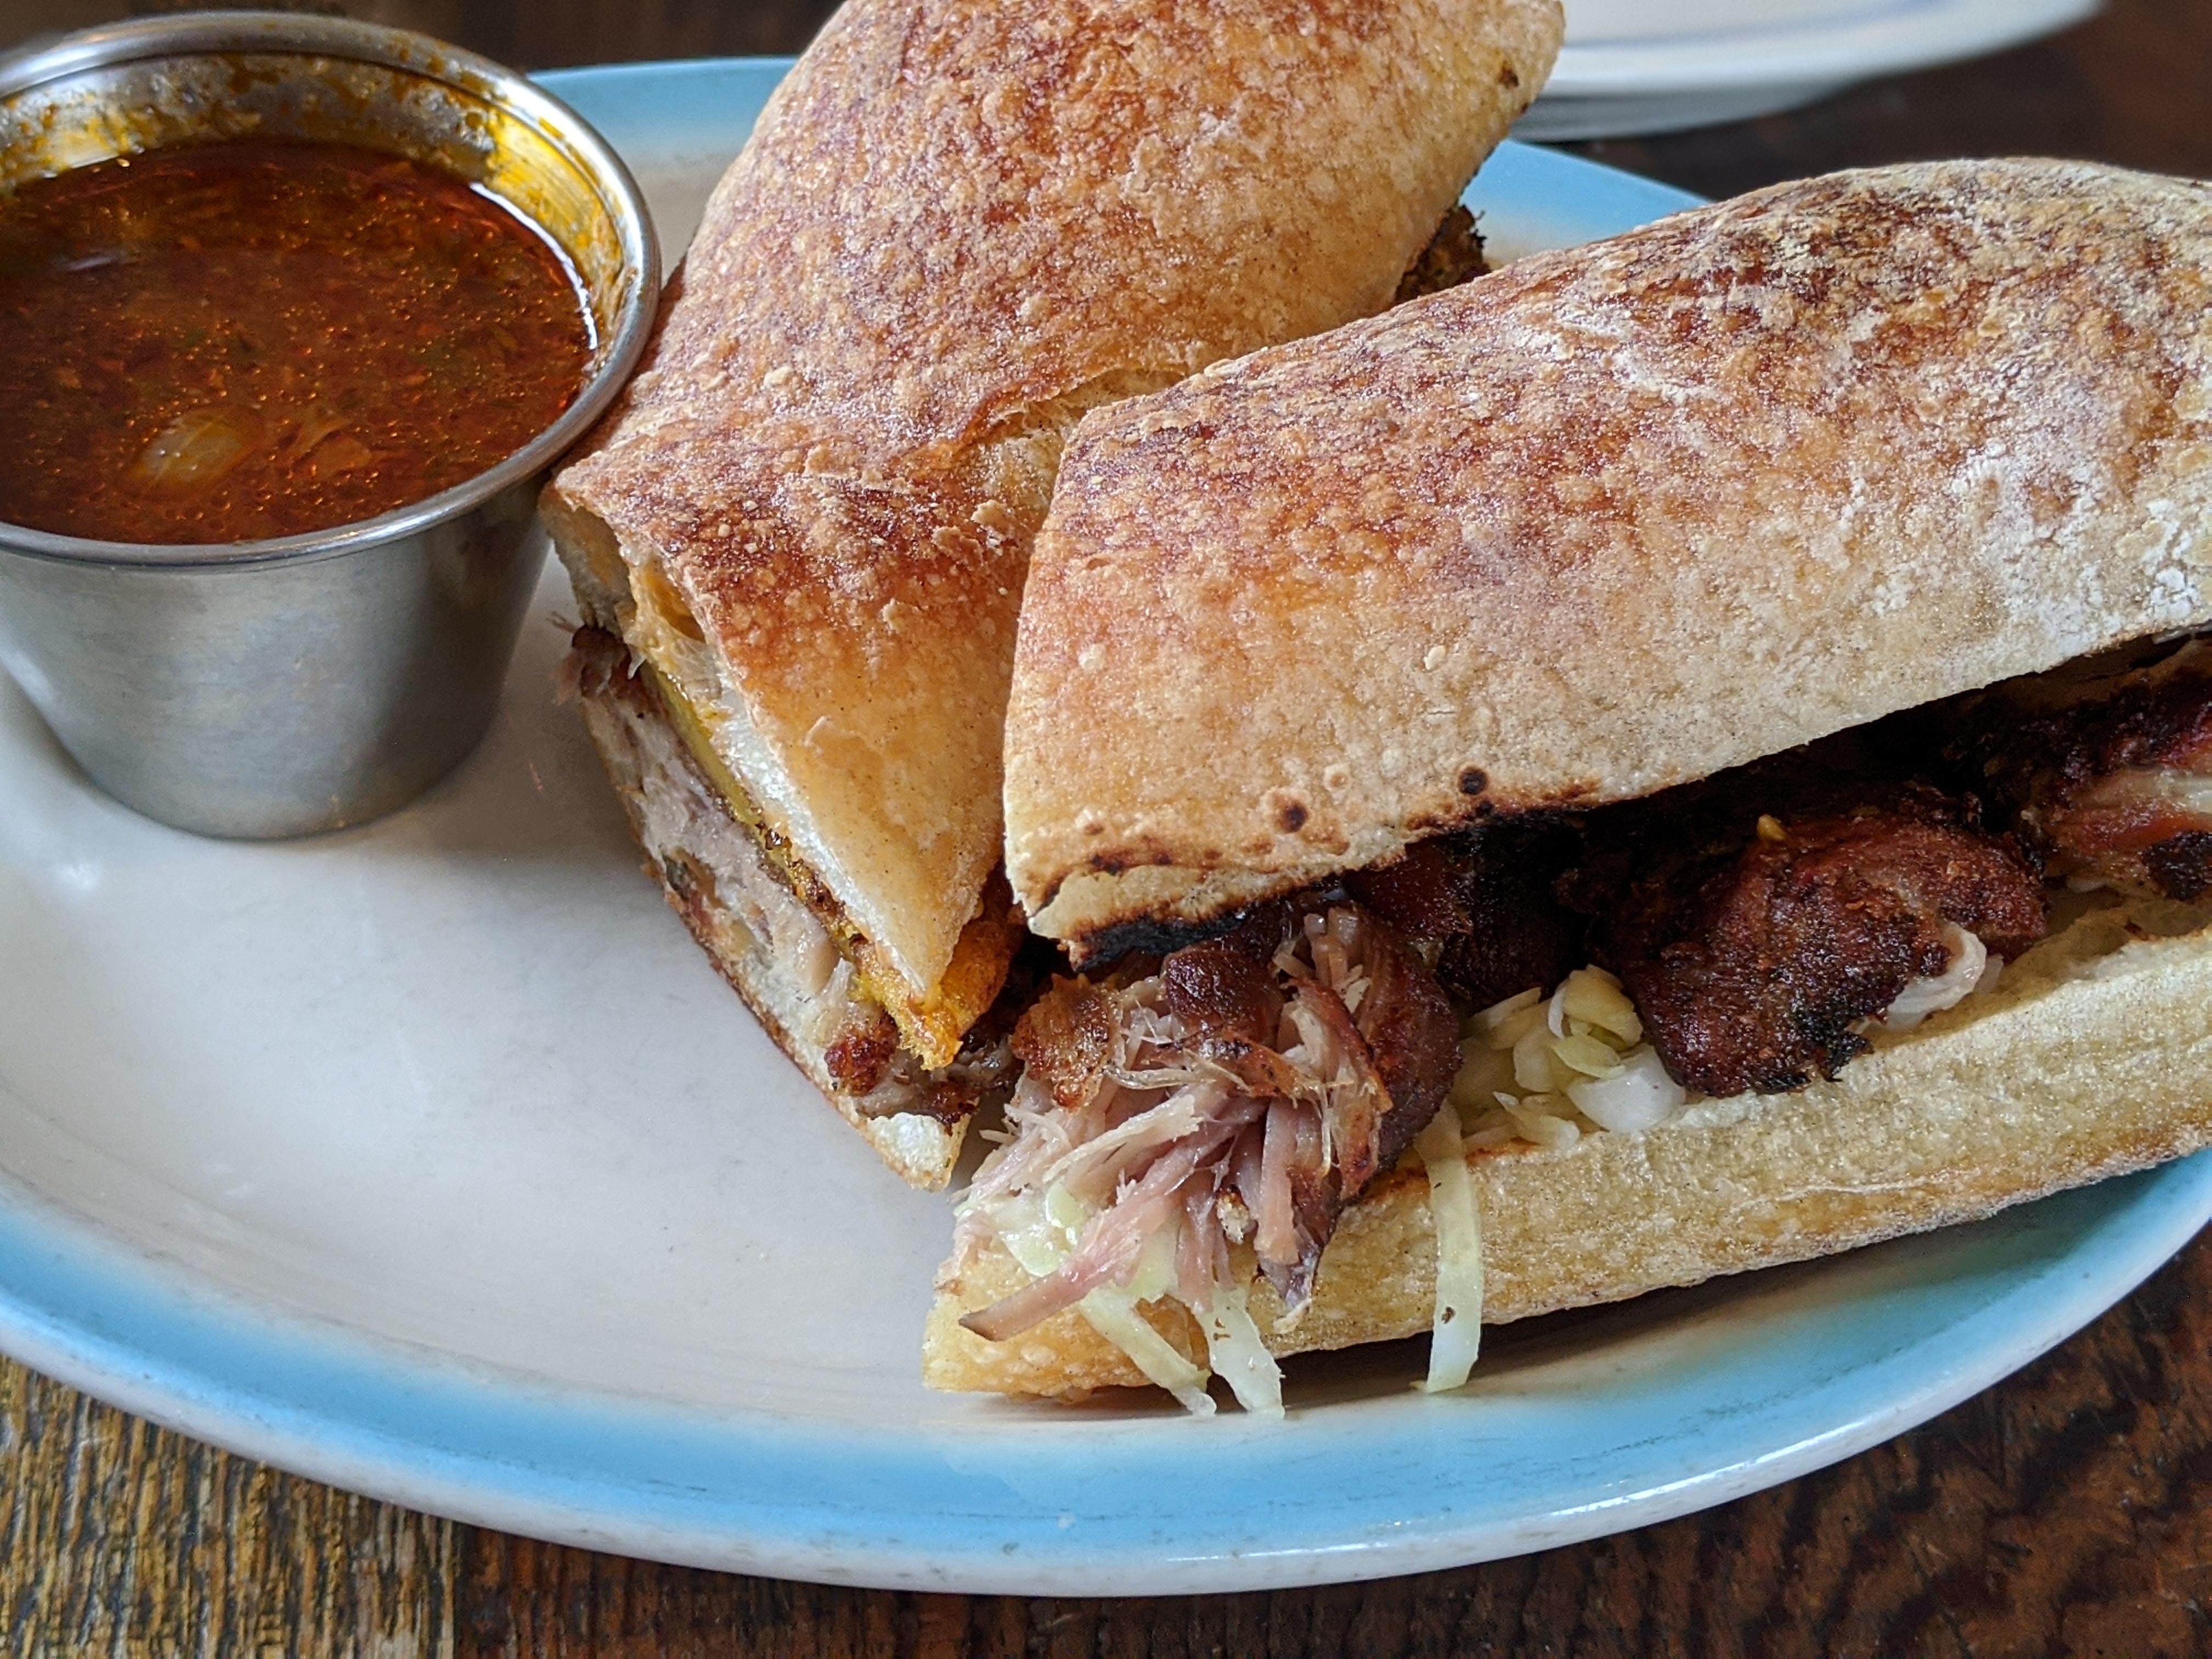 Haiti's Hallmark Fried Pork Dish Turns Into a Uniquely Flavorful Sandwich